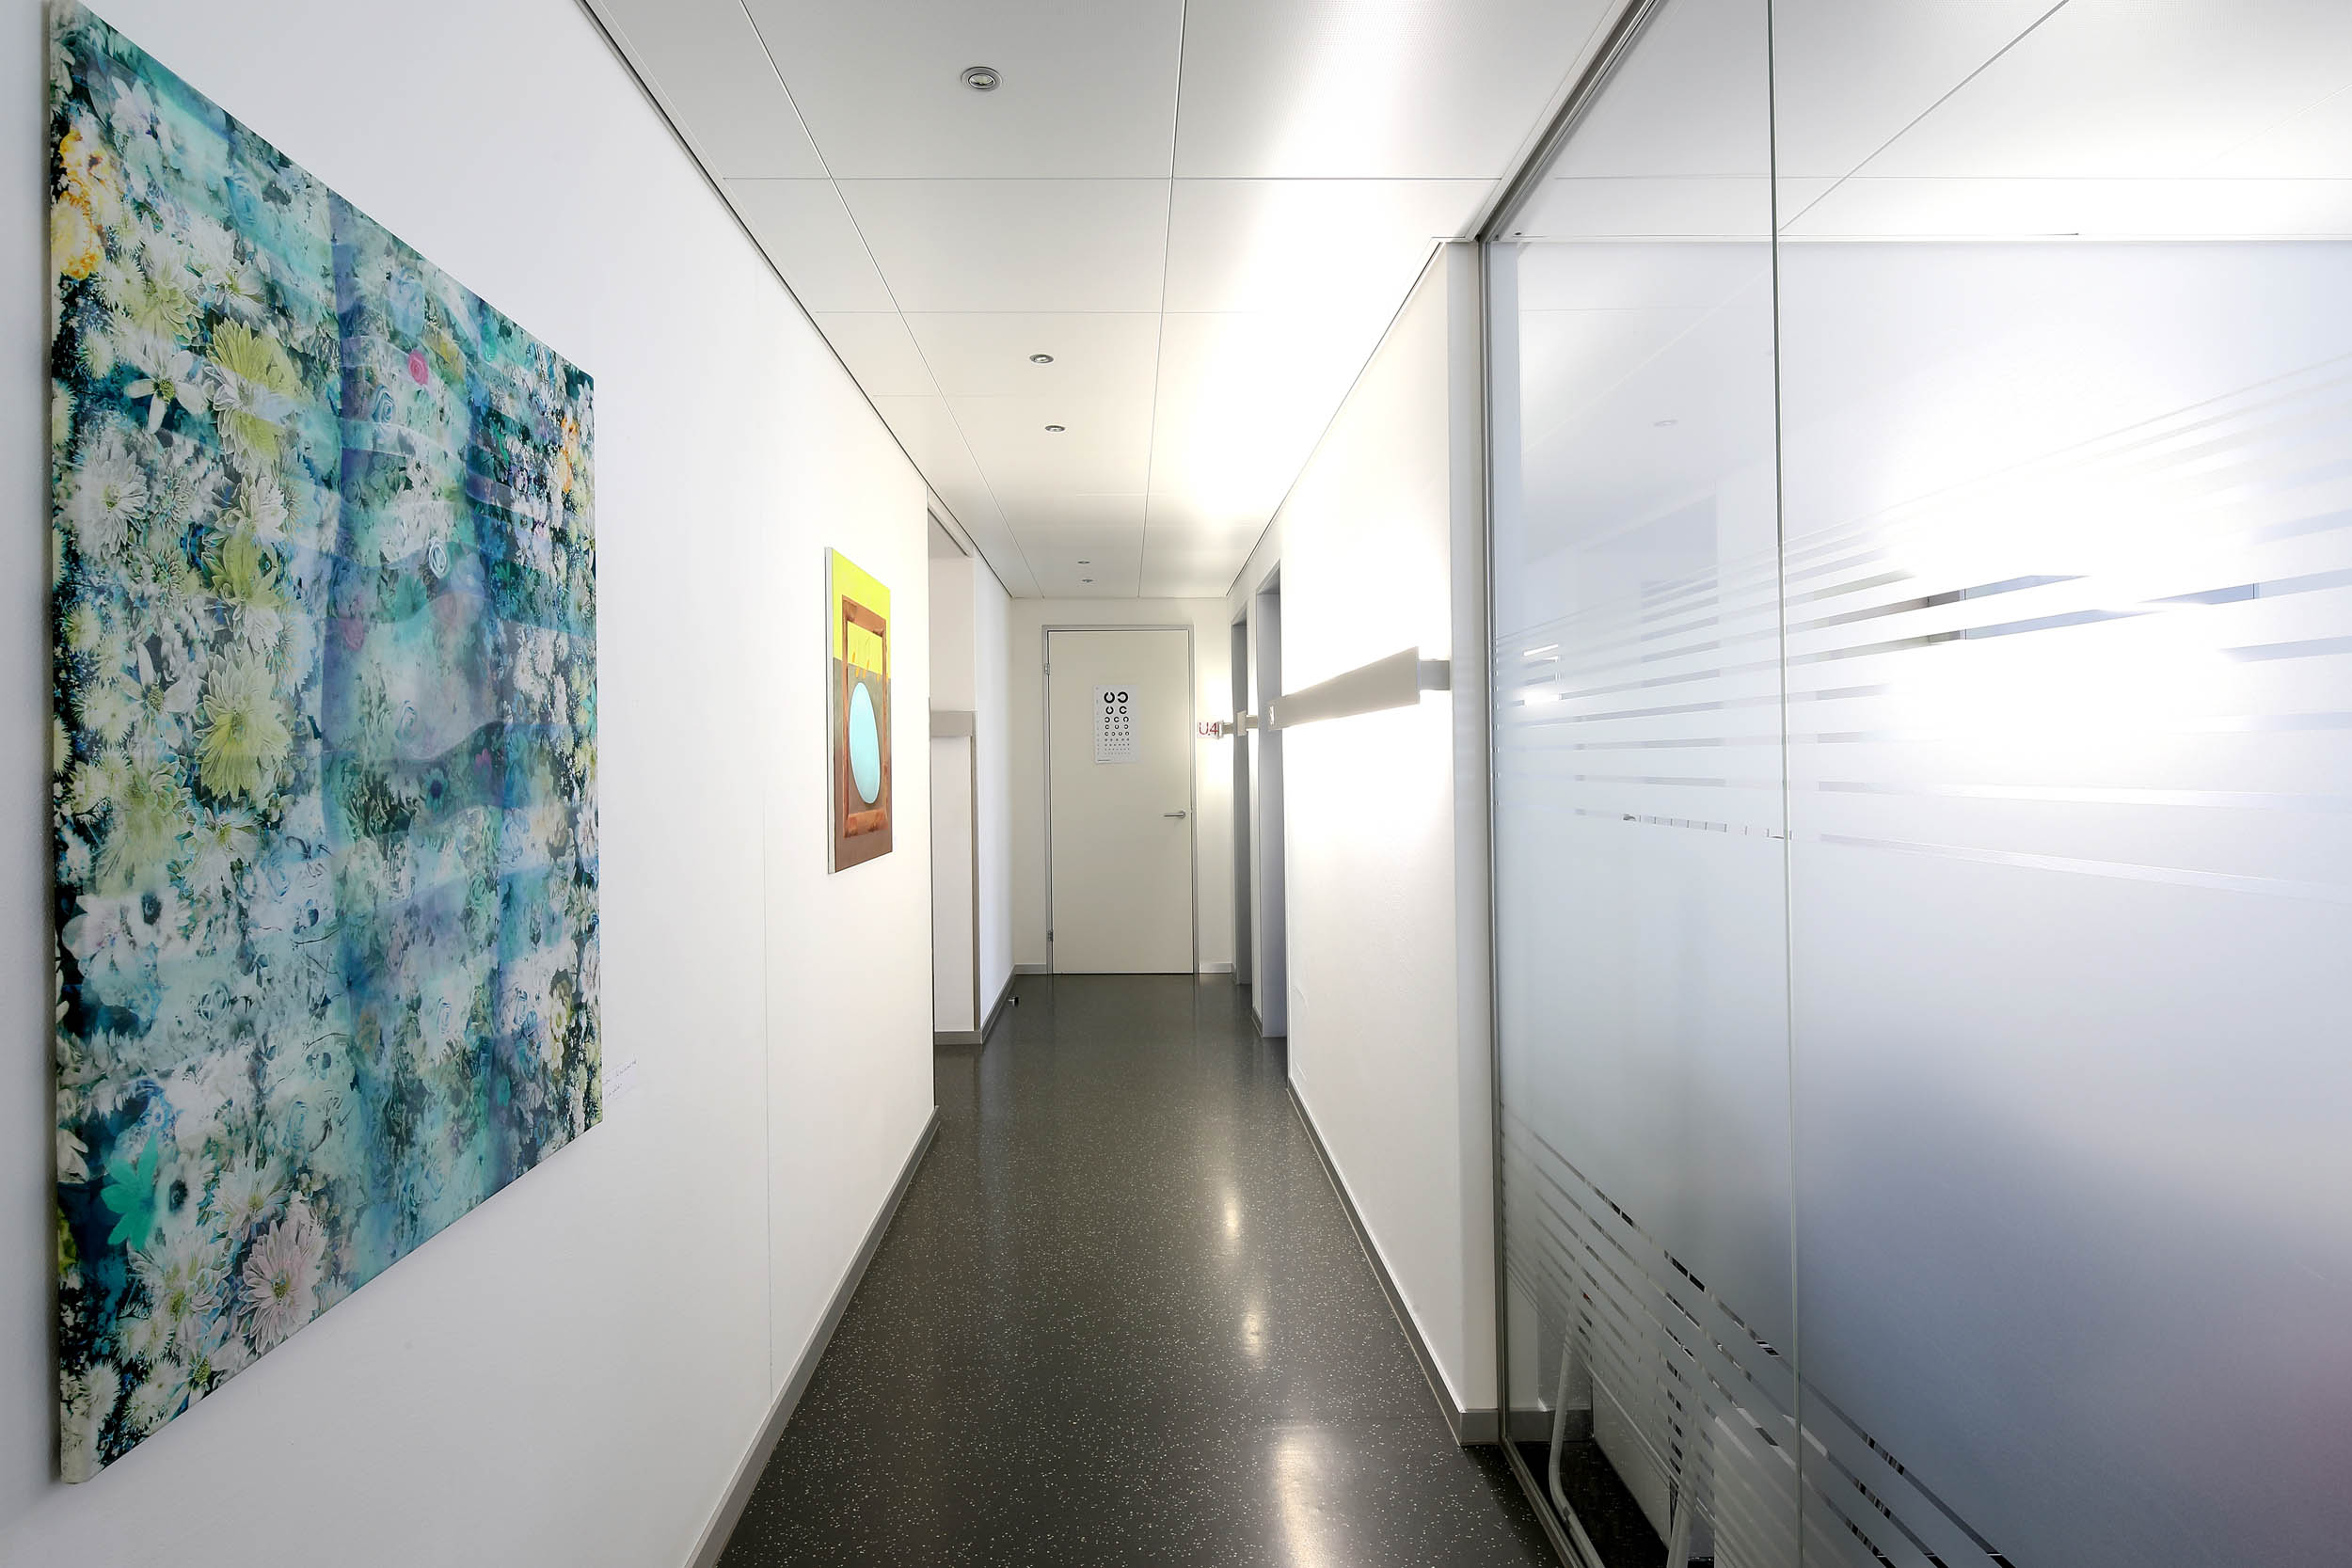 4652_praxisgemeinschaft-kofmehl-huus